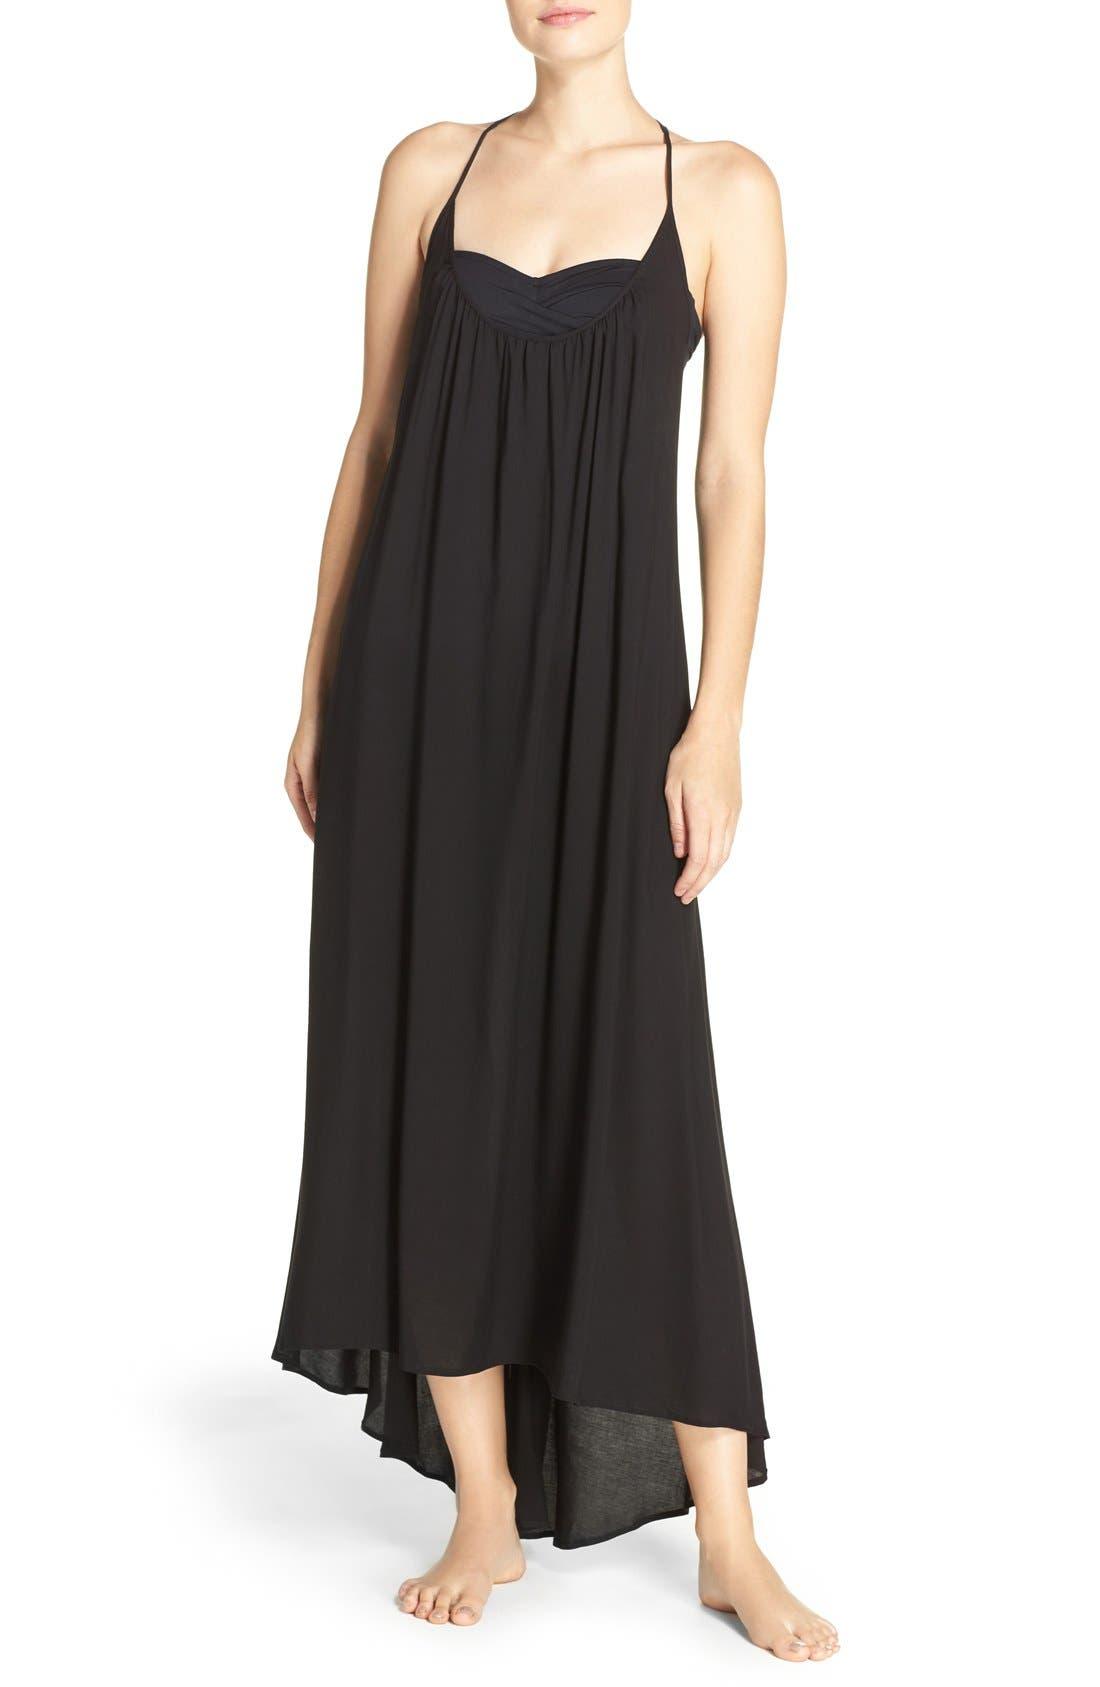 VINCE CAMUTO, Cover-Up Maxi Dress, Main thumbnail 1, color, 001